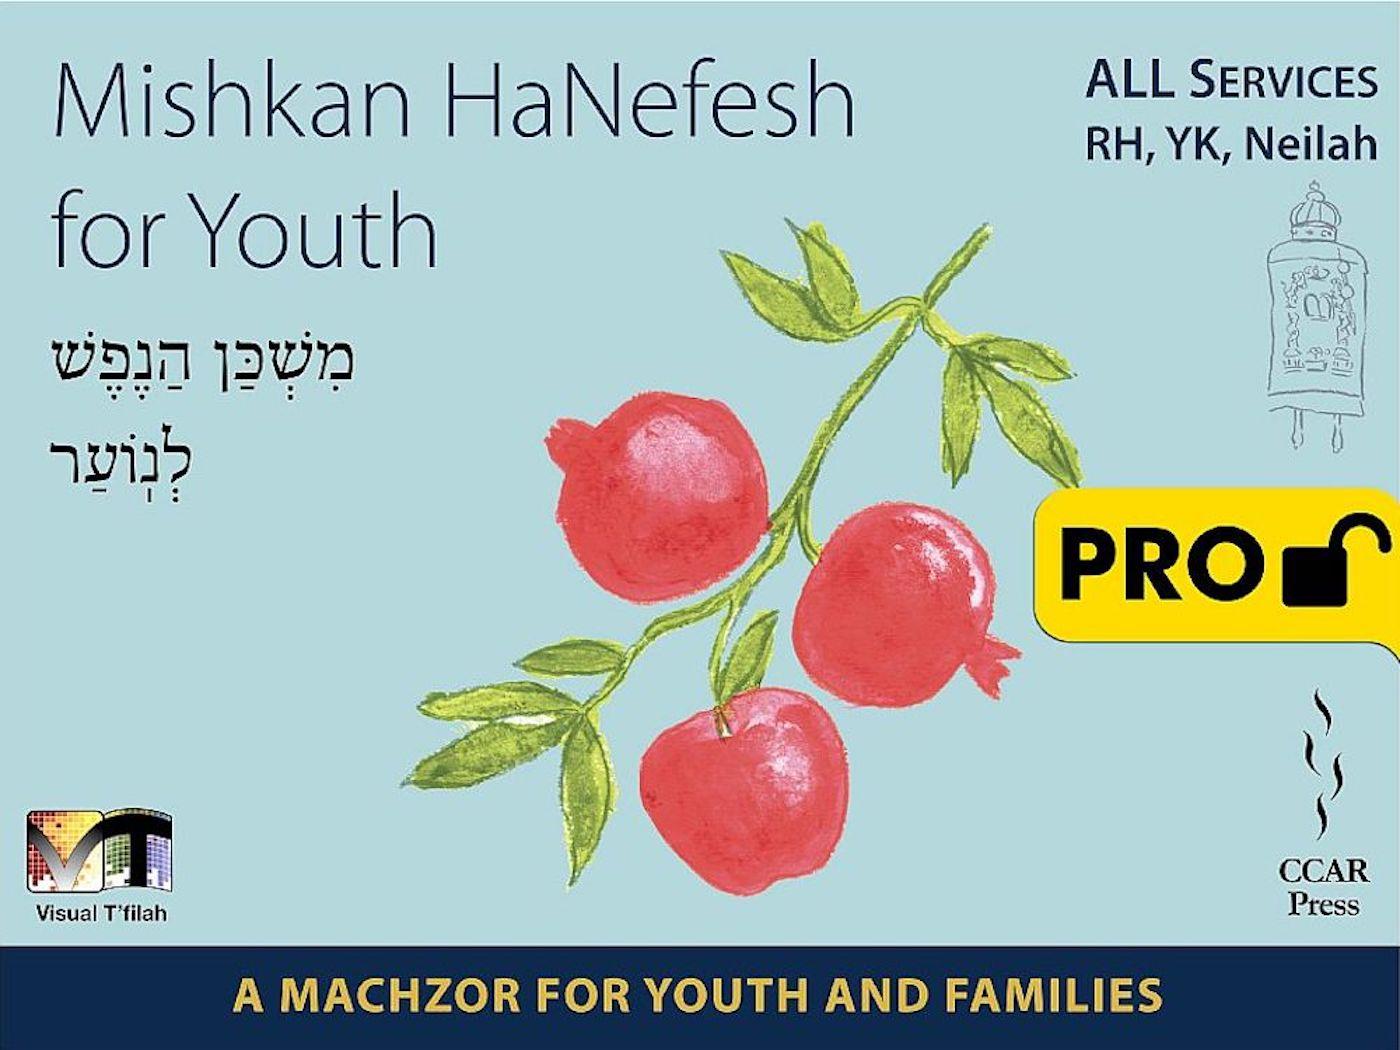 Mishkan HaNefesh for Youth Visual T'filah - All - Pro